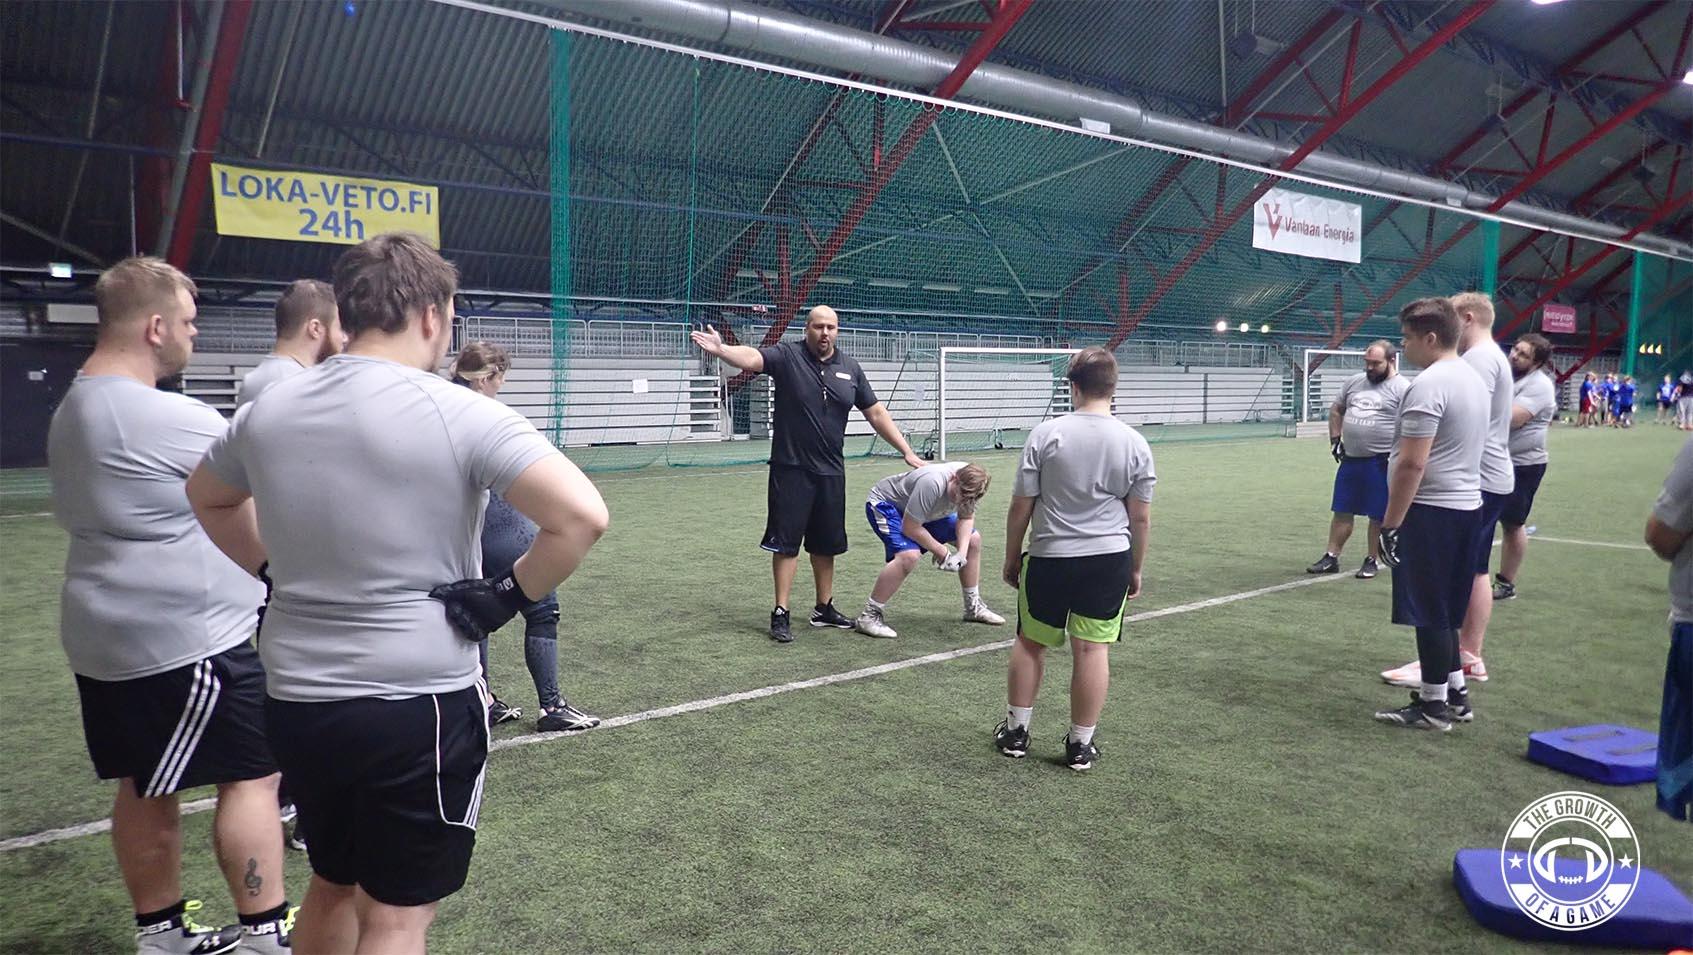 2019 Vantaa Skills Camp Players